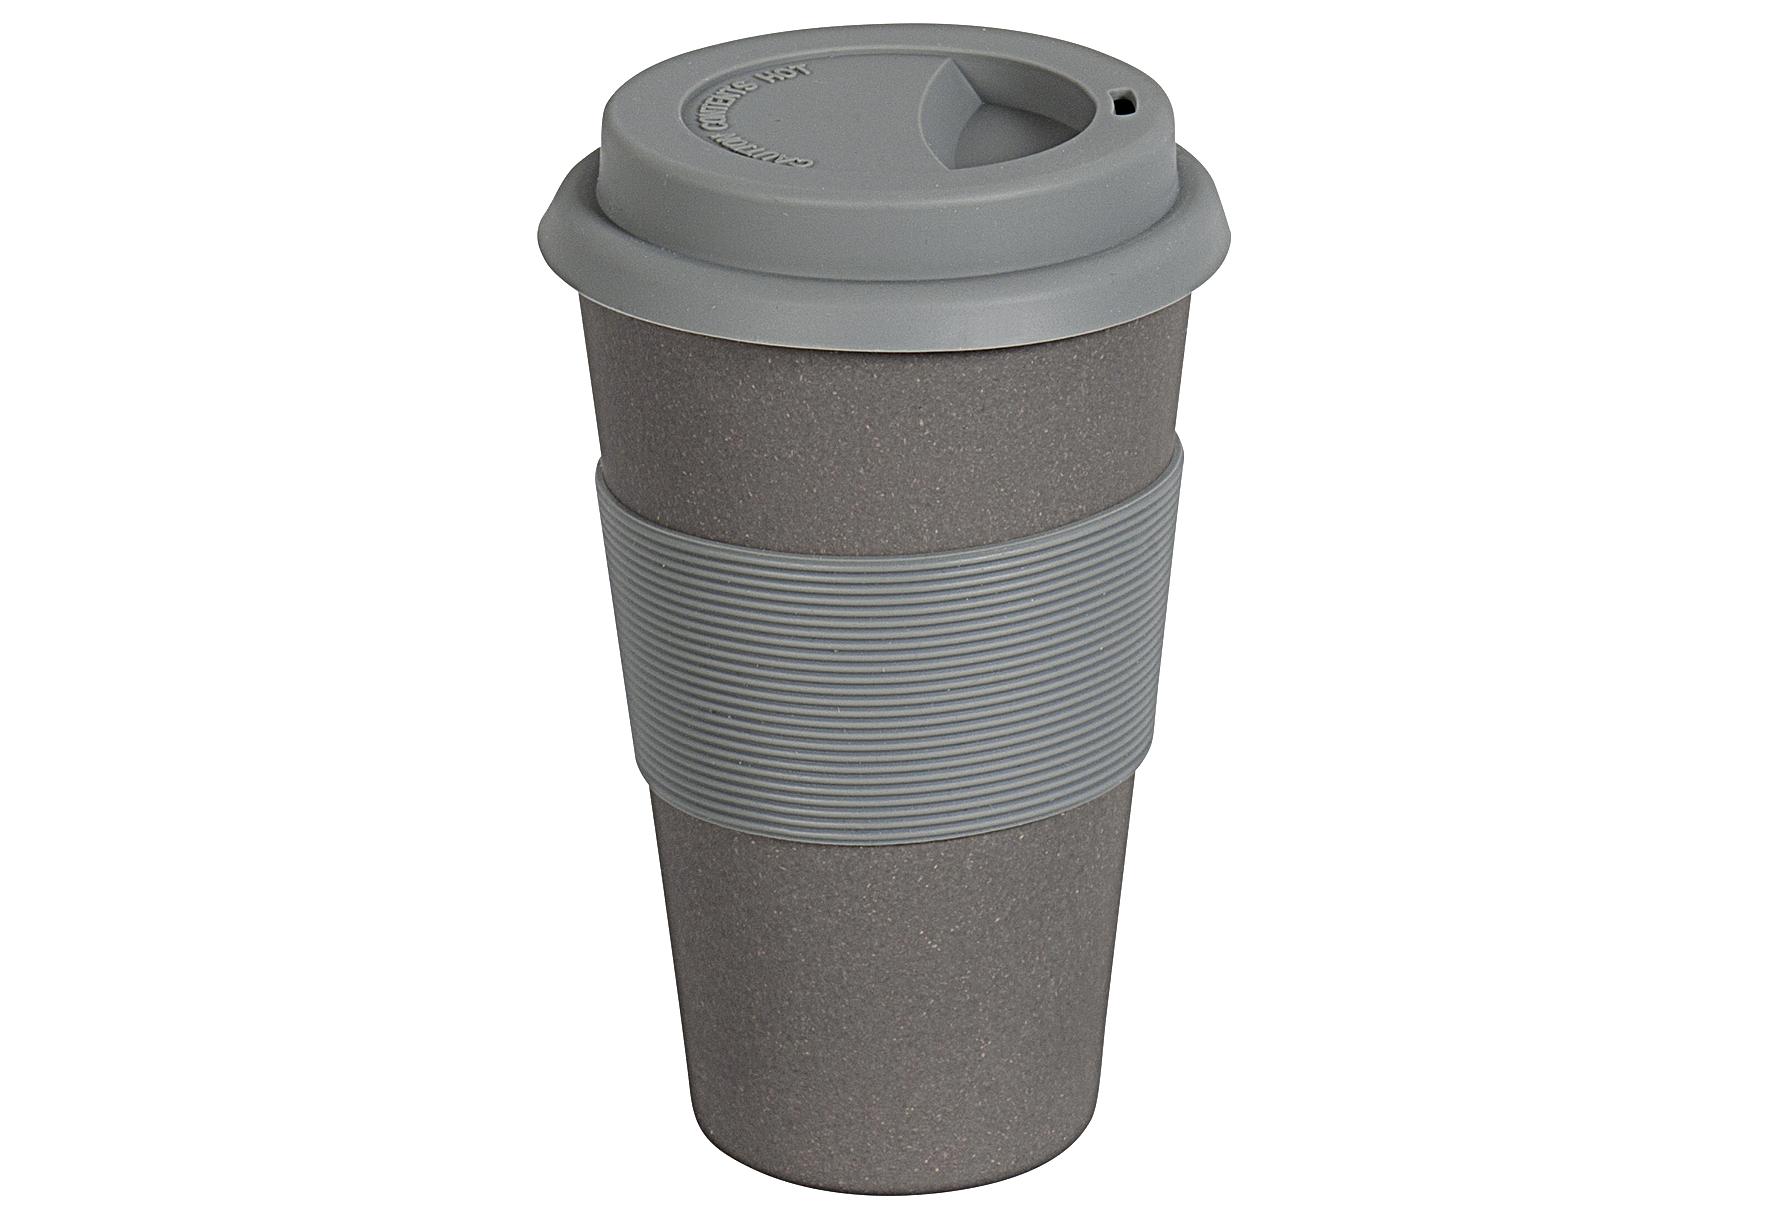 MAGU Becher Coffee to go Natur Design 350 ml schiefer ca. 70 % Cellulose (gewonnen aus Bambusfasern, Maisstärke und Holzfasern) / ca. 30 % Harze, lebensmittelecht